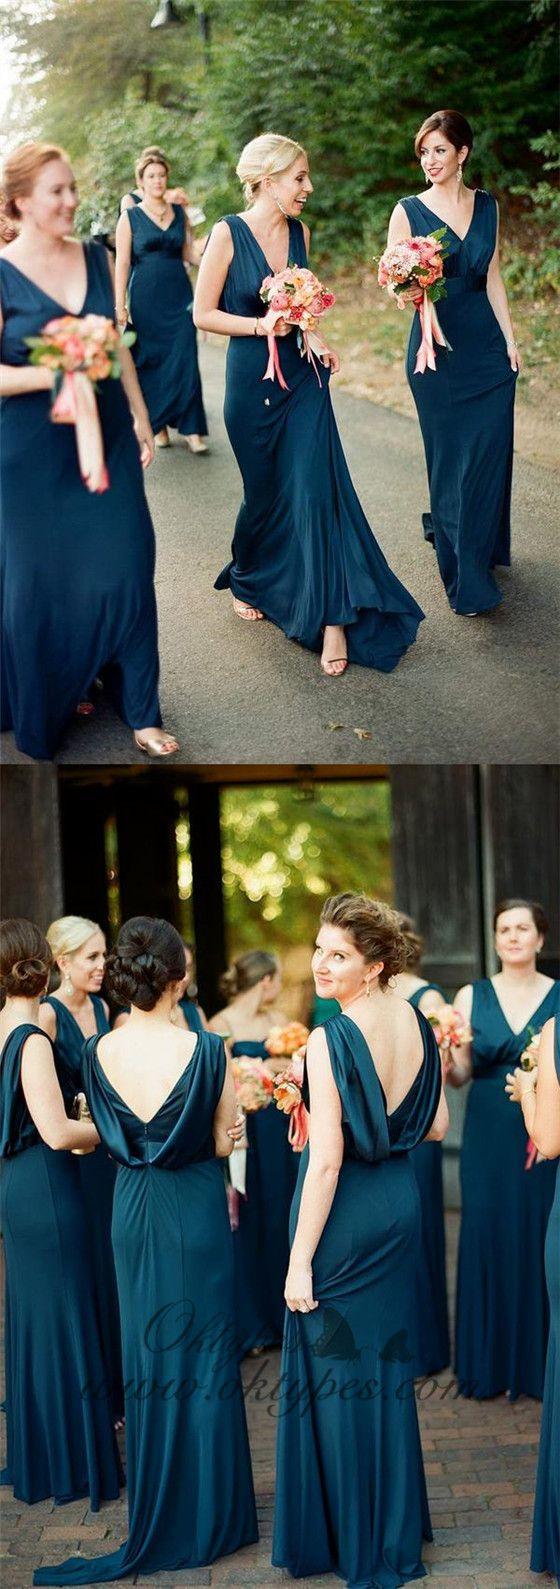 T-length lace wedding dresses november 2018 Simple Plus Size V Neck Cheap Teal Sheath Long Bridesmaid Dresses